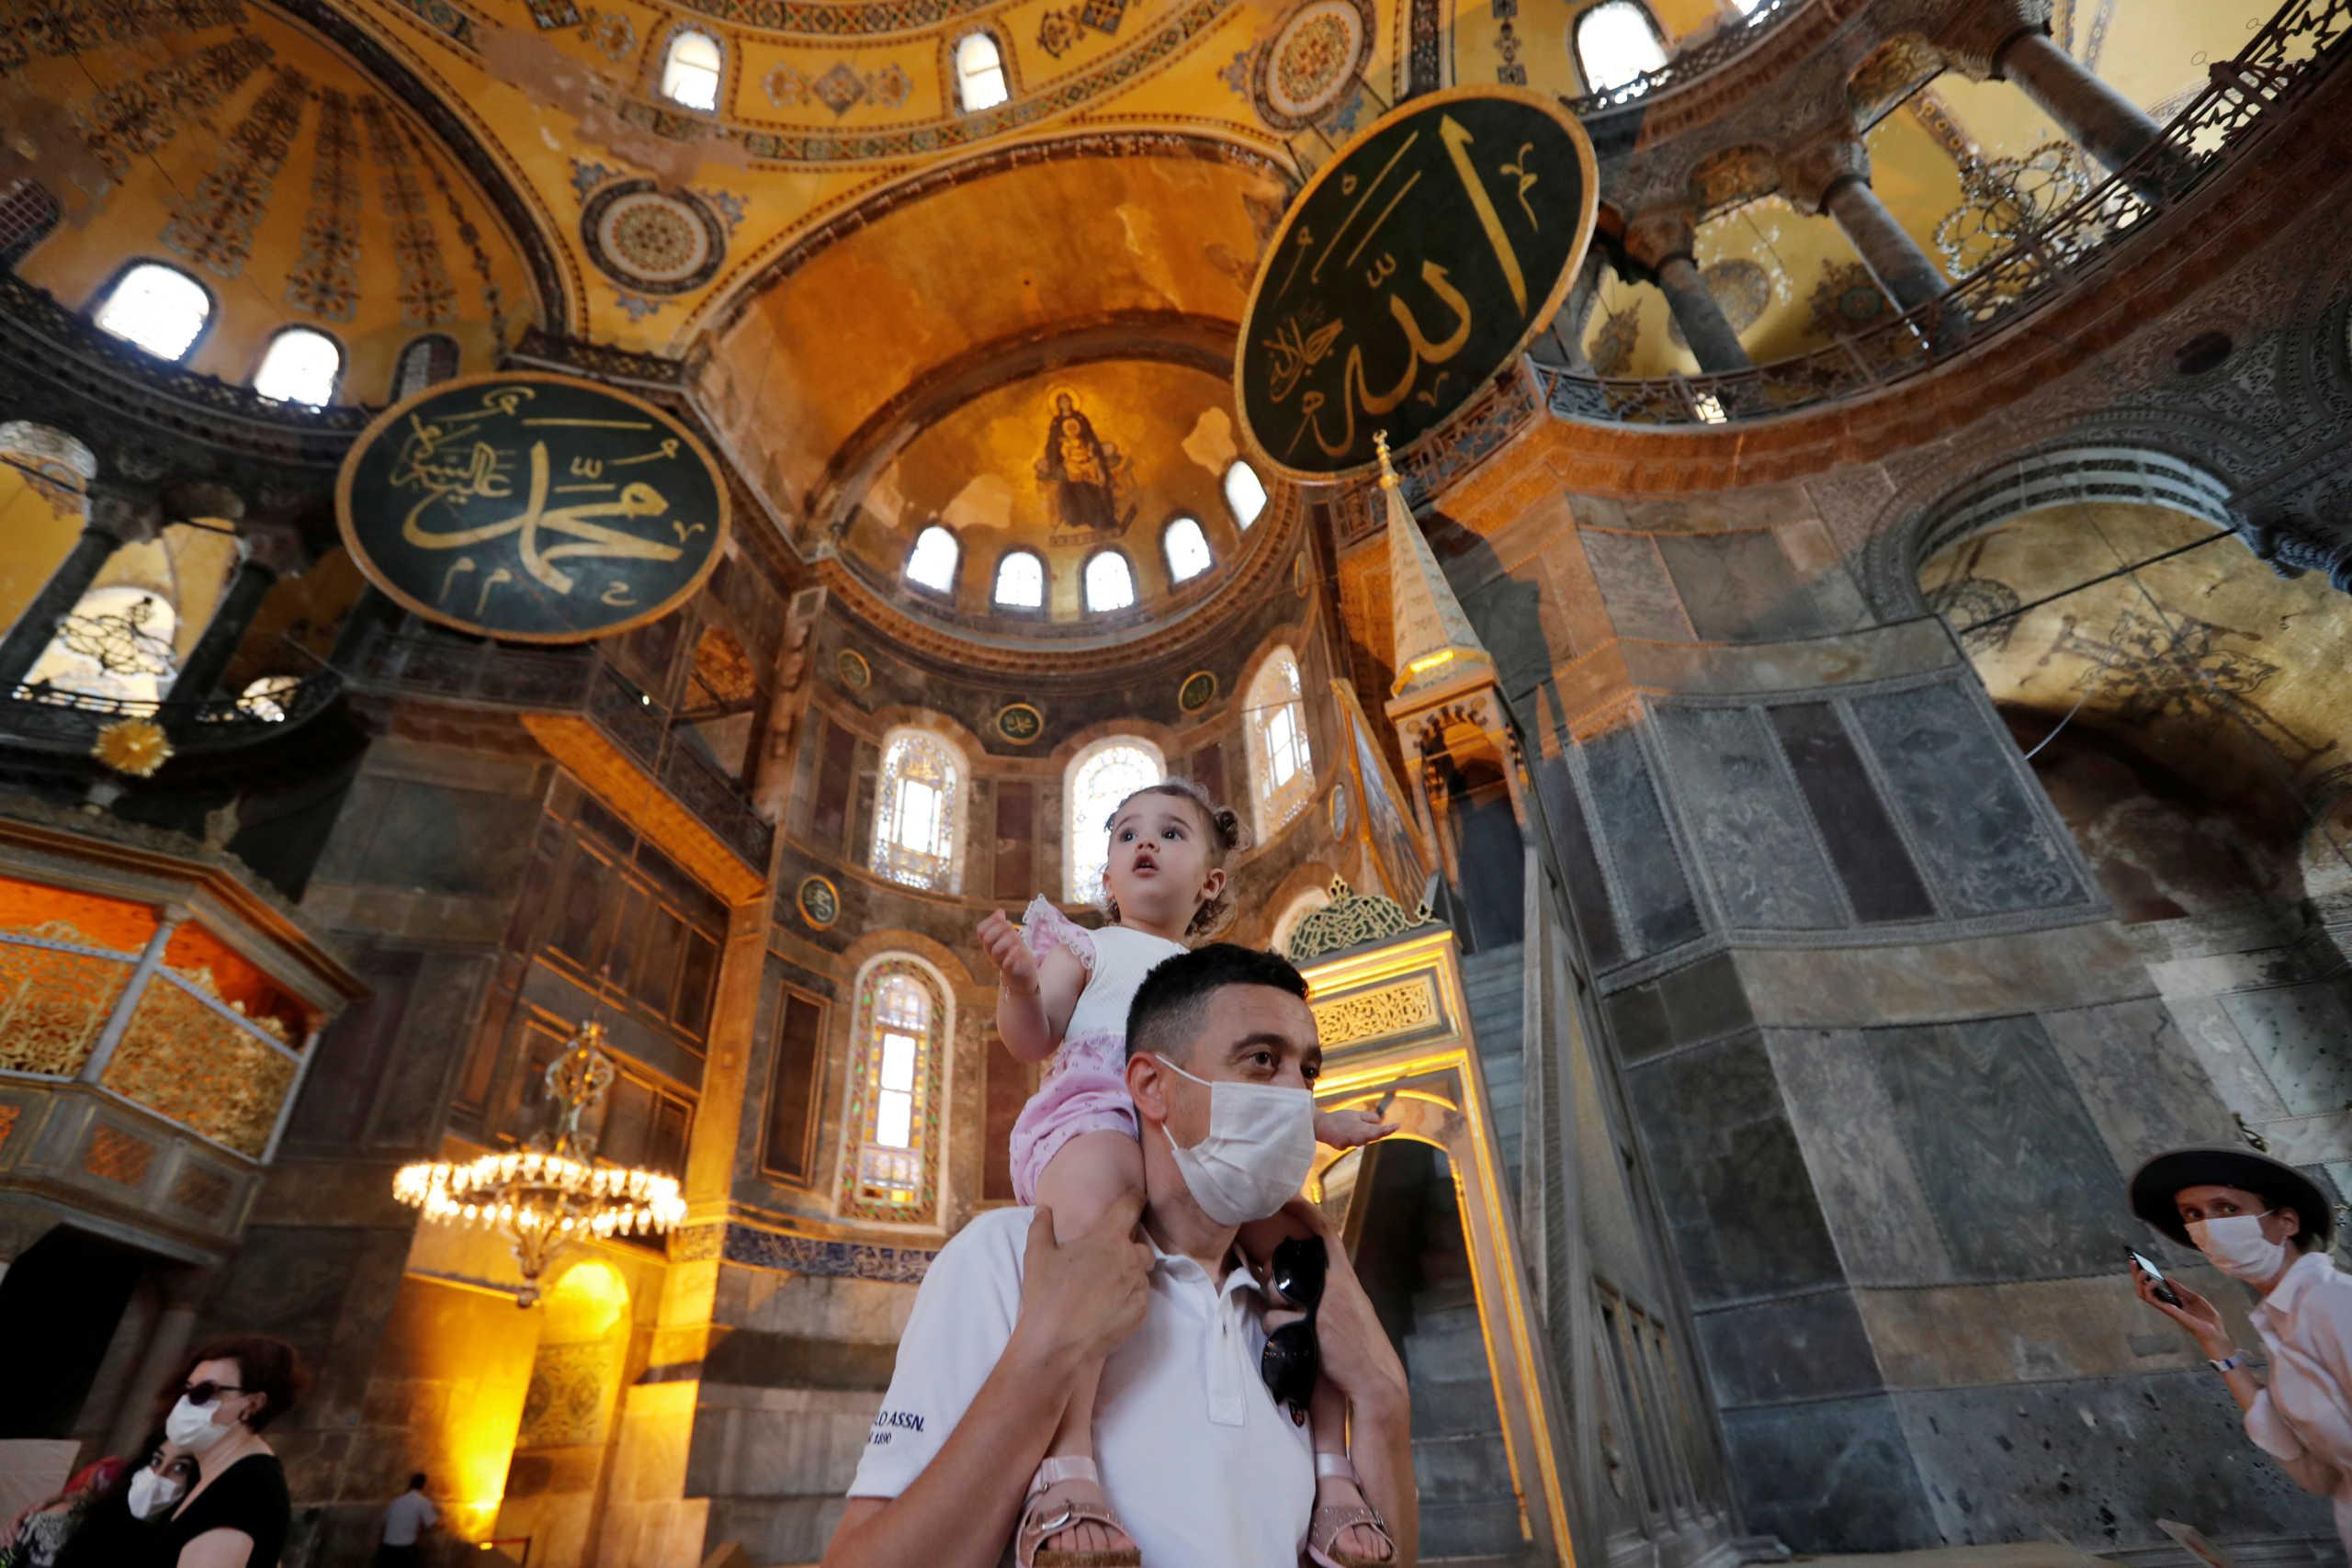 H Αγιά Σοφιά, ο Ερντογάν και το βιβλίο που χρησιμοποίησε ως όπλο για την μετατροπή της σε τζαμί